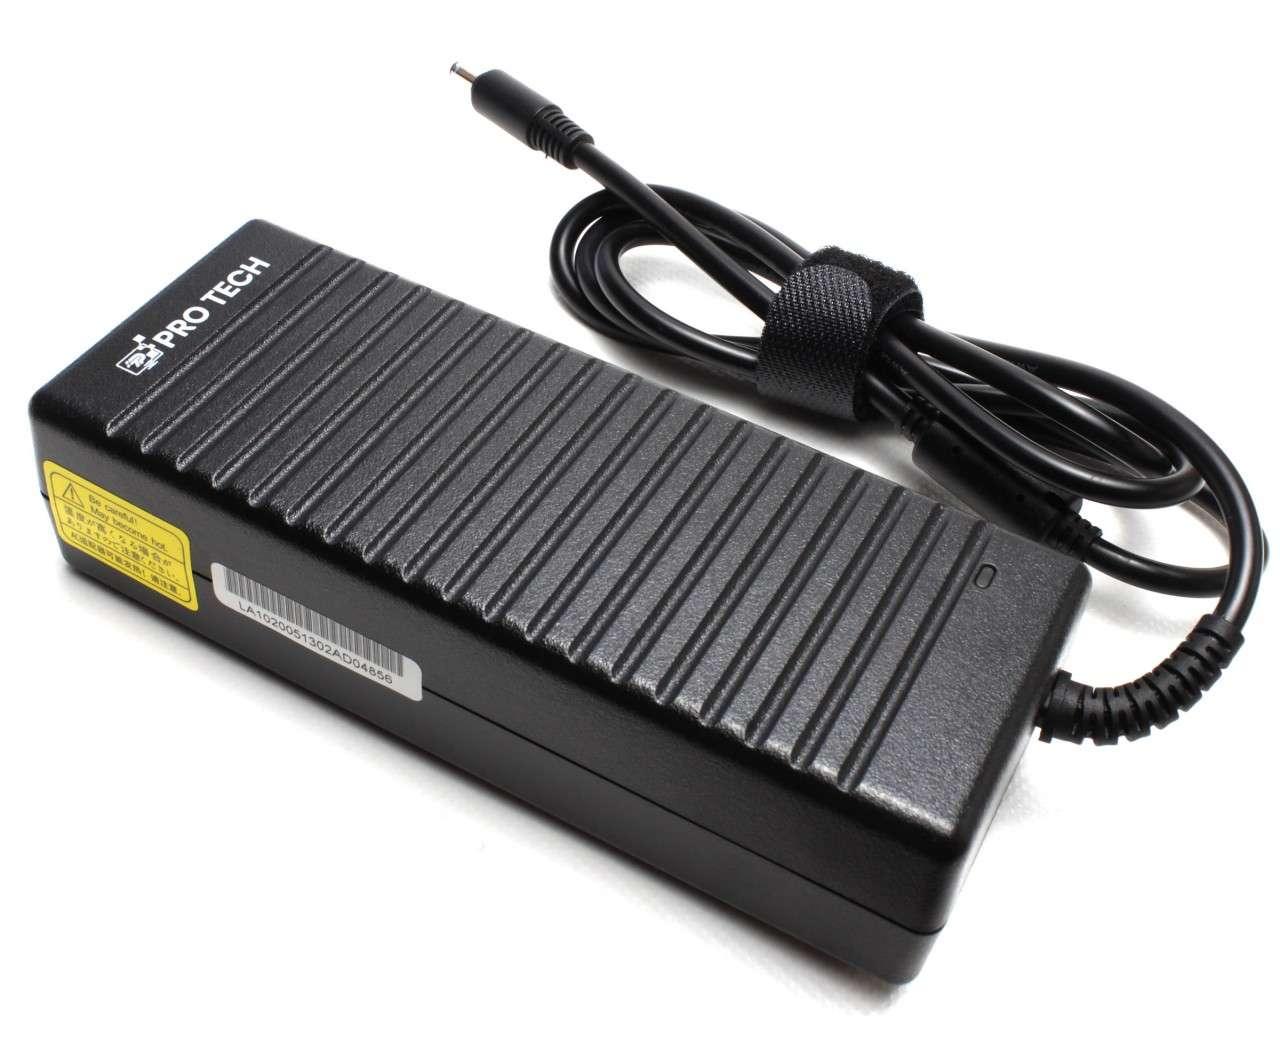 Incarcator Dell Precision 15 9550 130W Replacement imagine powerlaptop.ro 2021